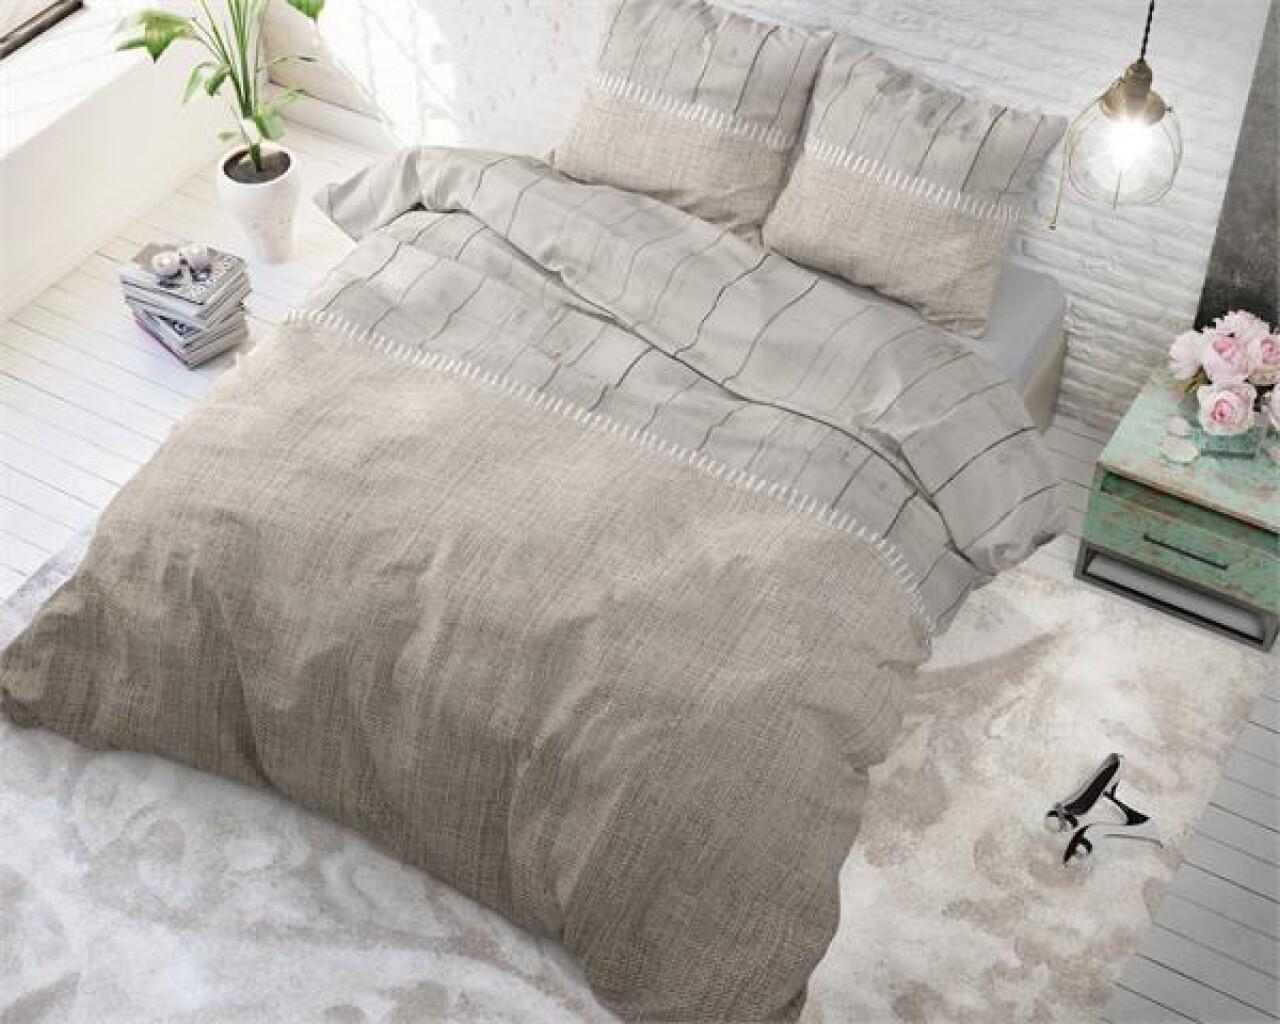 Lenjerie de pat pentru doua persoane Wood Fabric Taupe, Royal Textile,100% bumbac